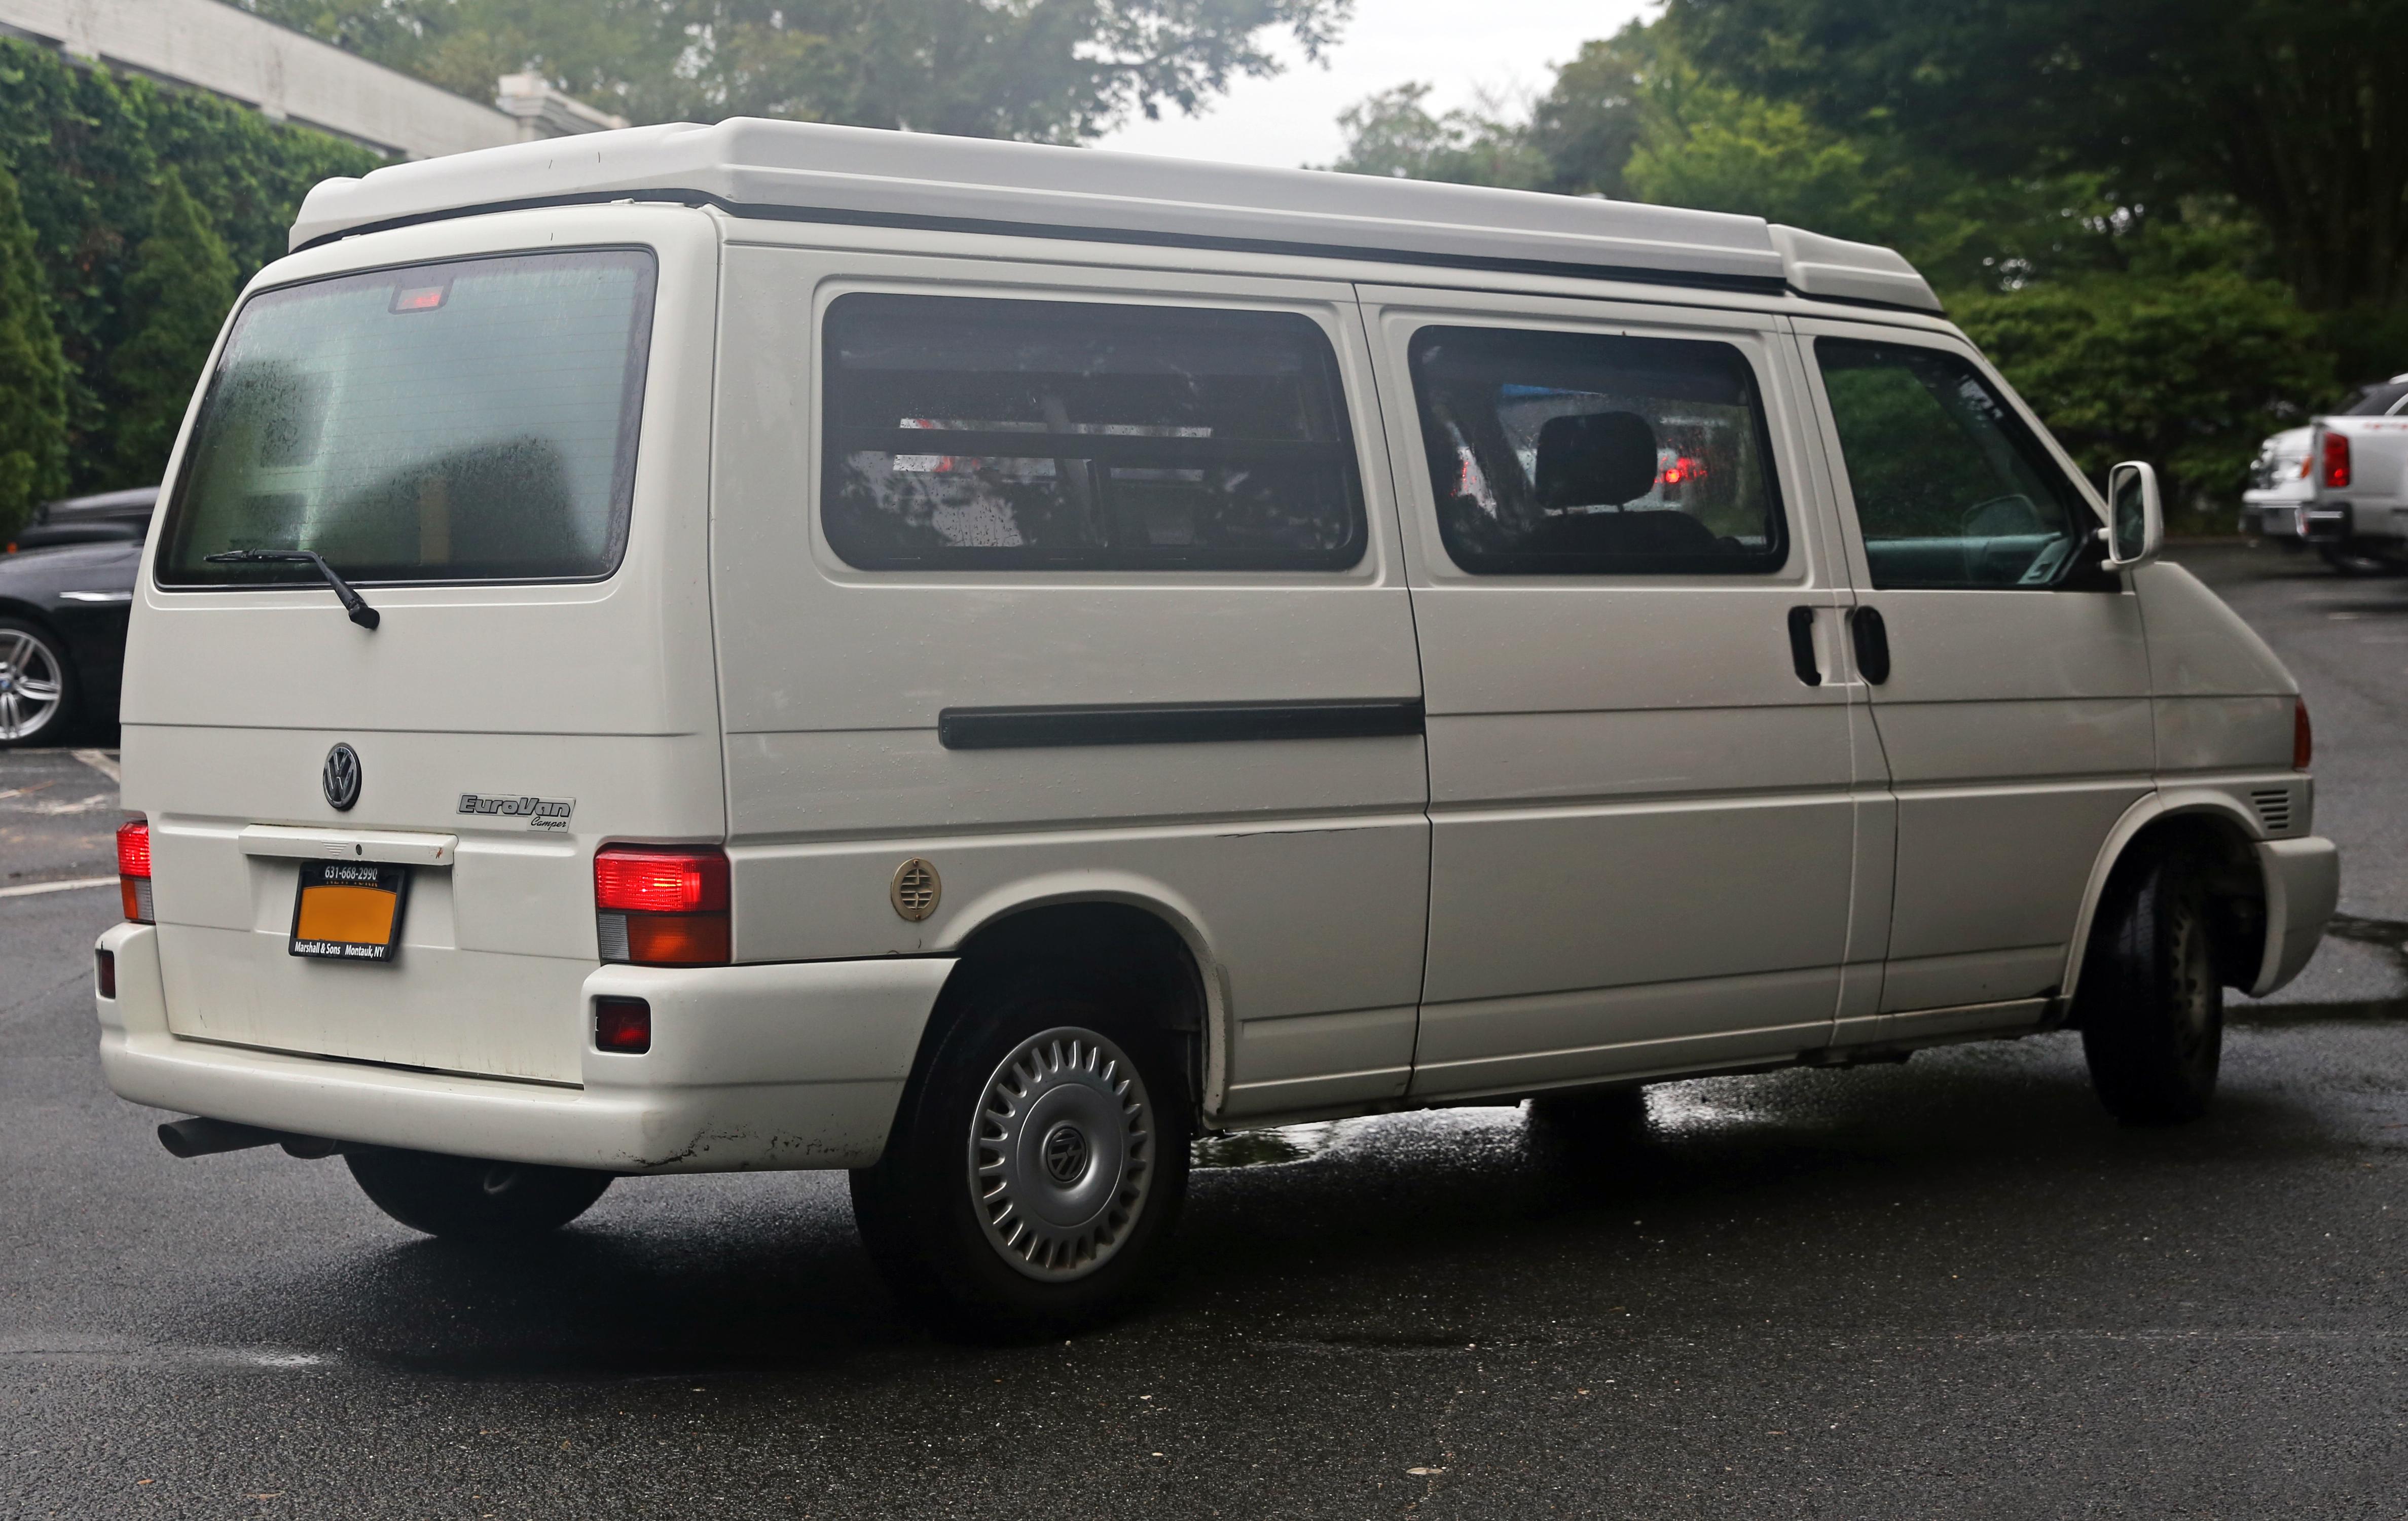 Vw Eurovan Camper >> File Volkswagen Eurovan Camper By Winnebago Rear Right Jpg